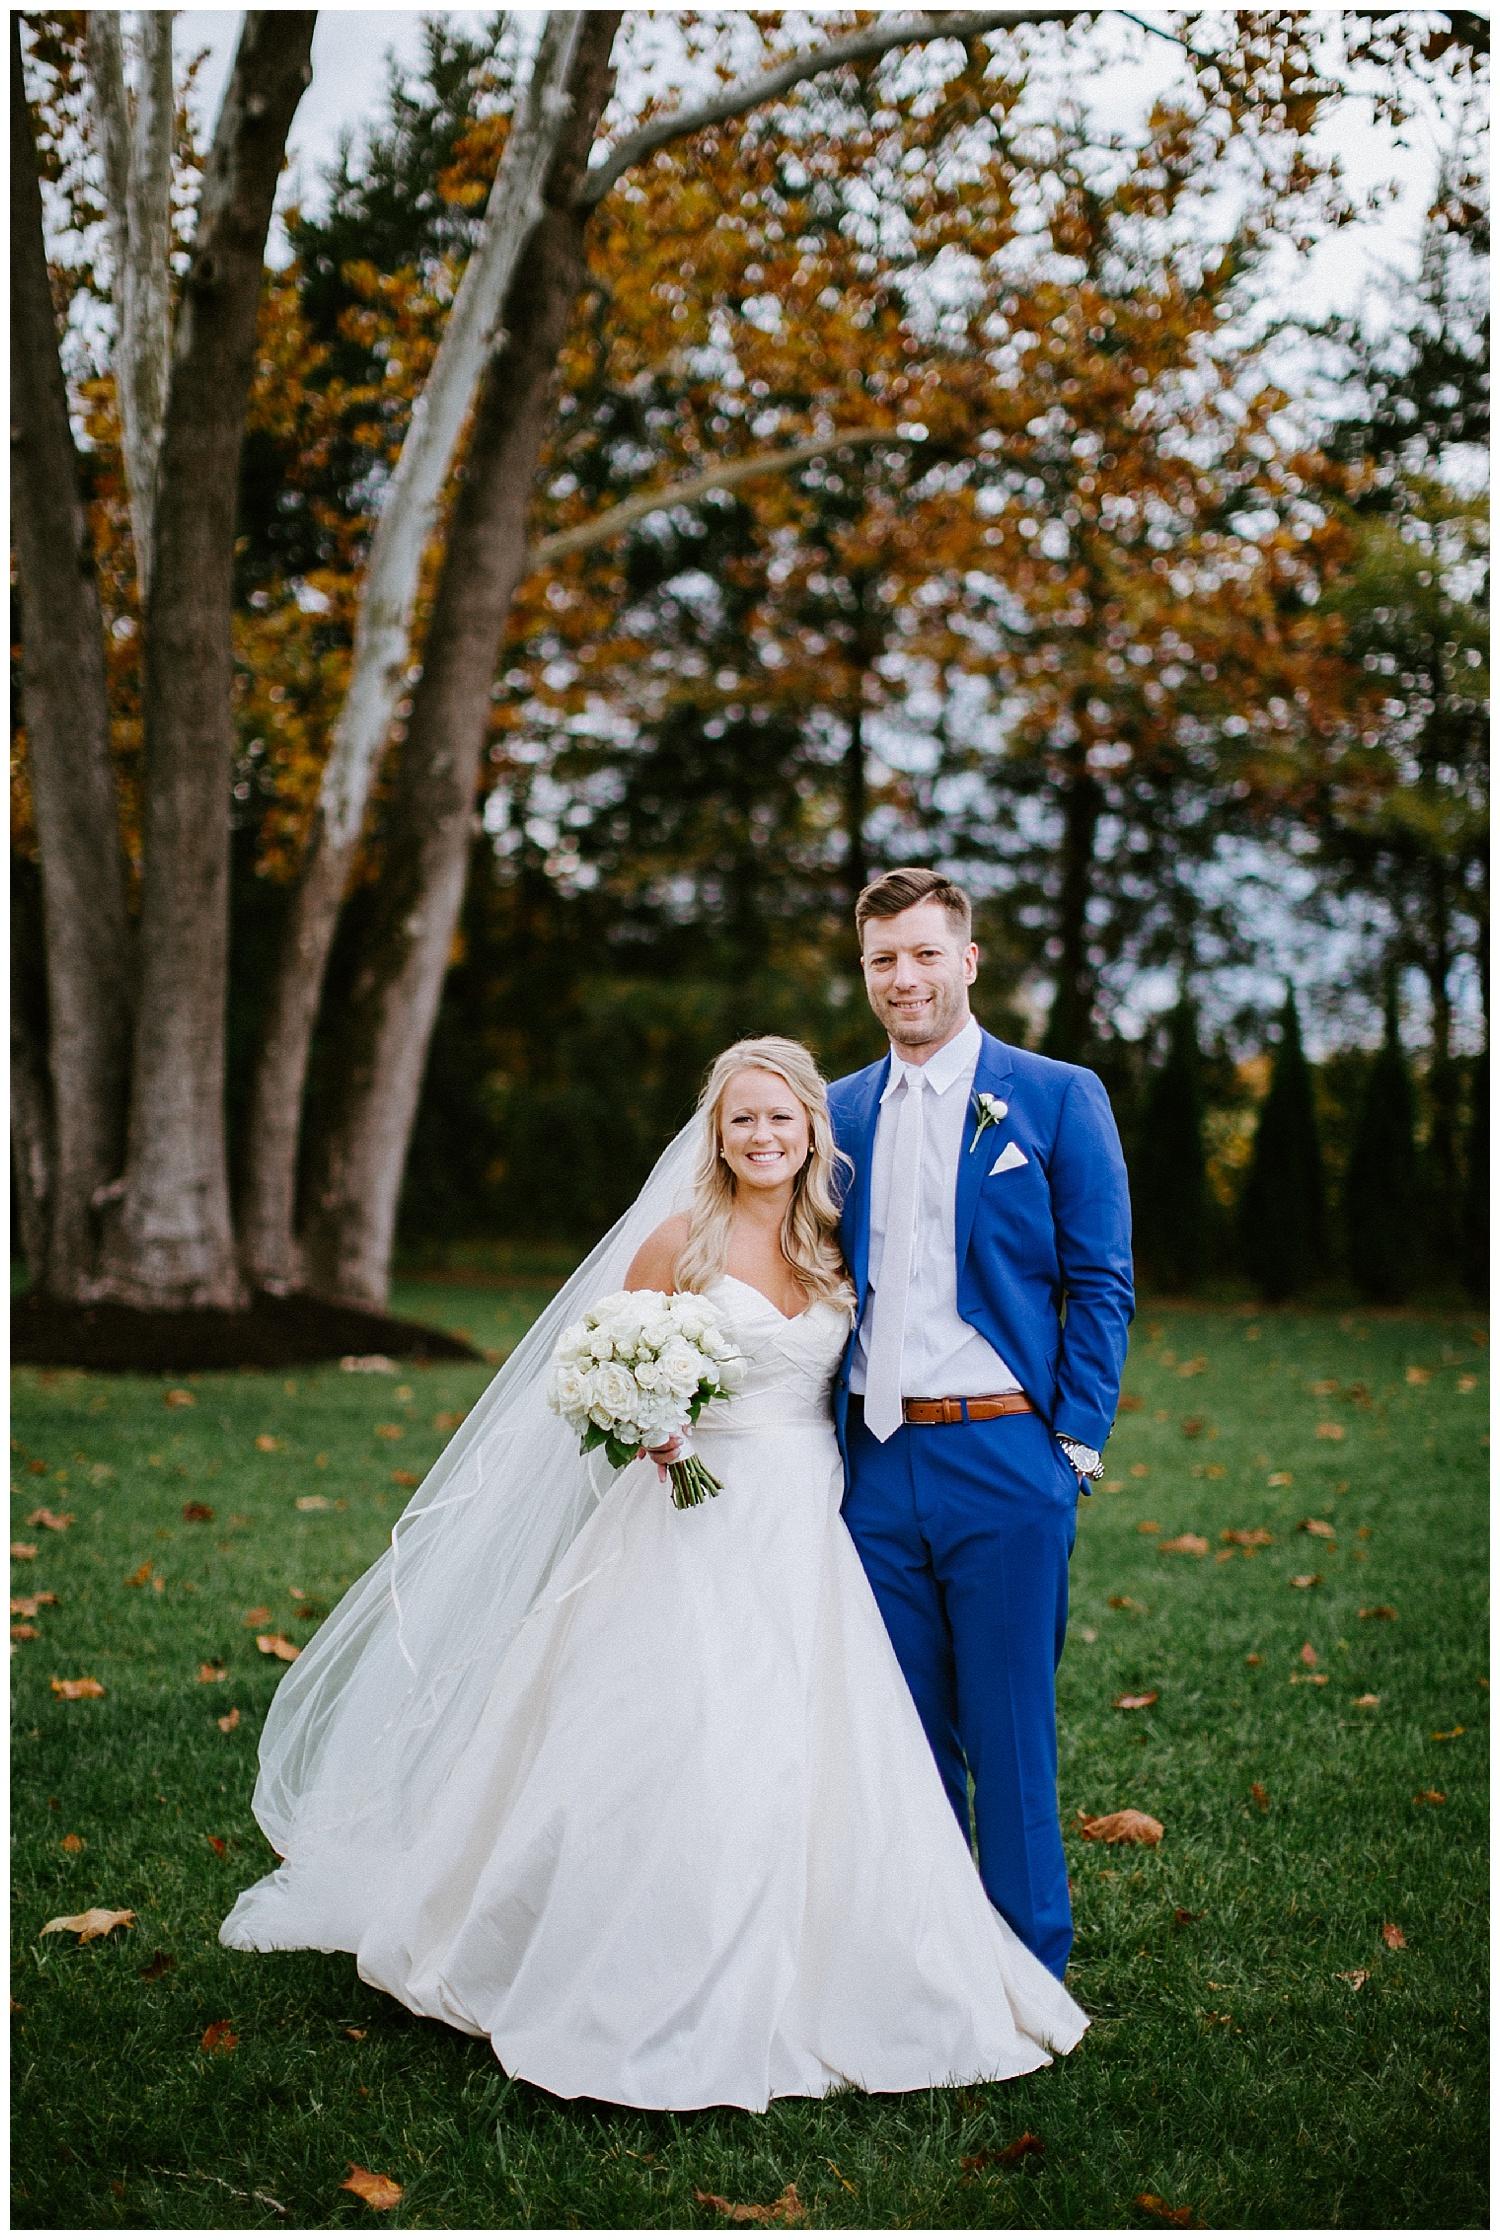 classy-wedding-sycamore_farms-nashville-tn2019-01-22_0029.jpg